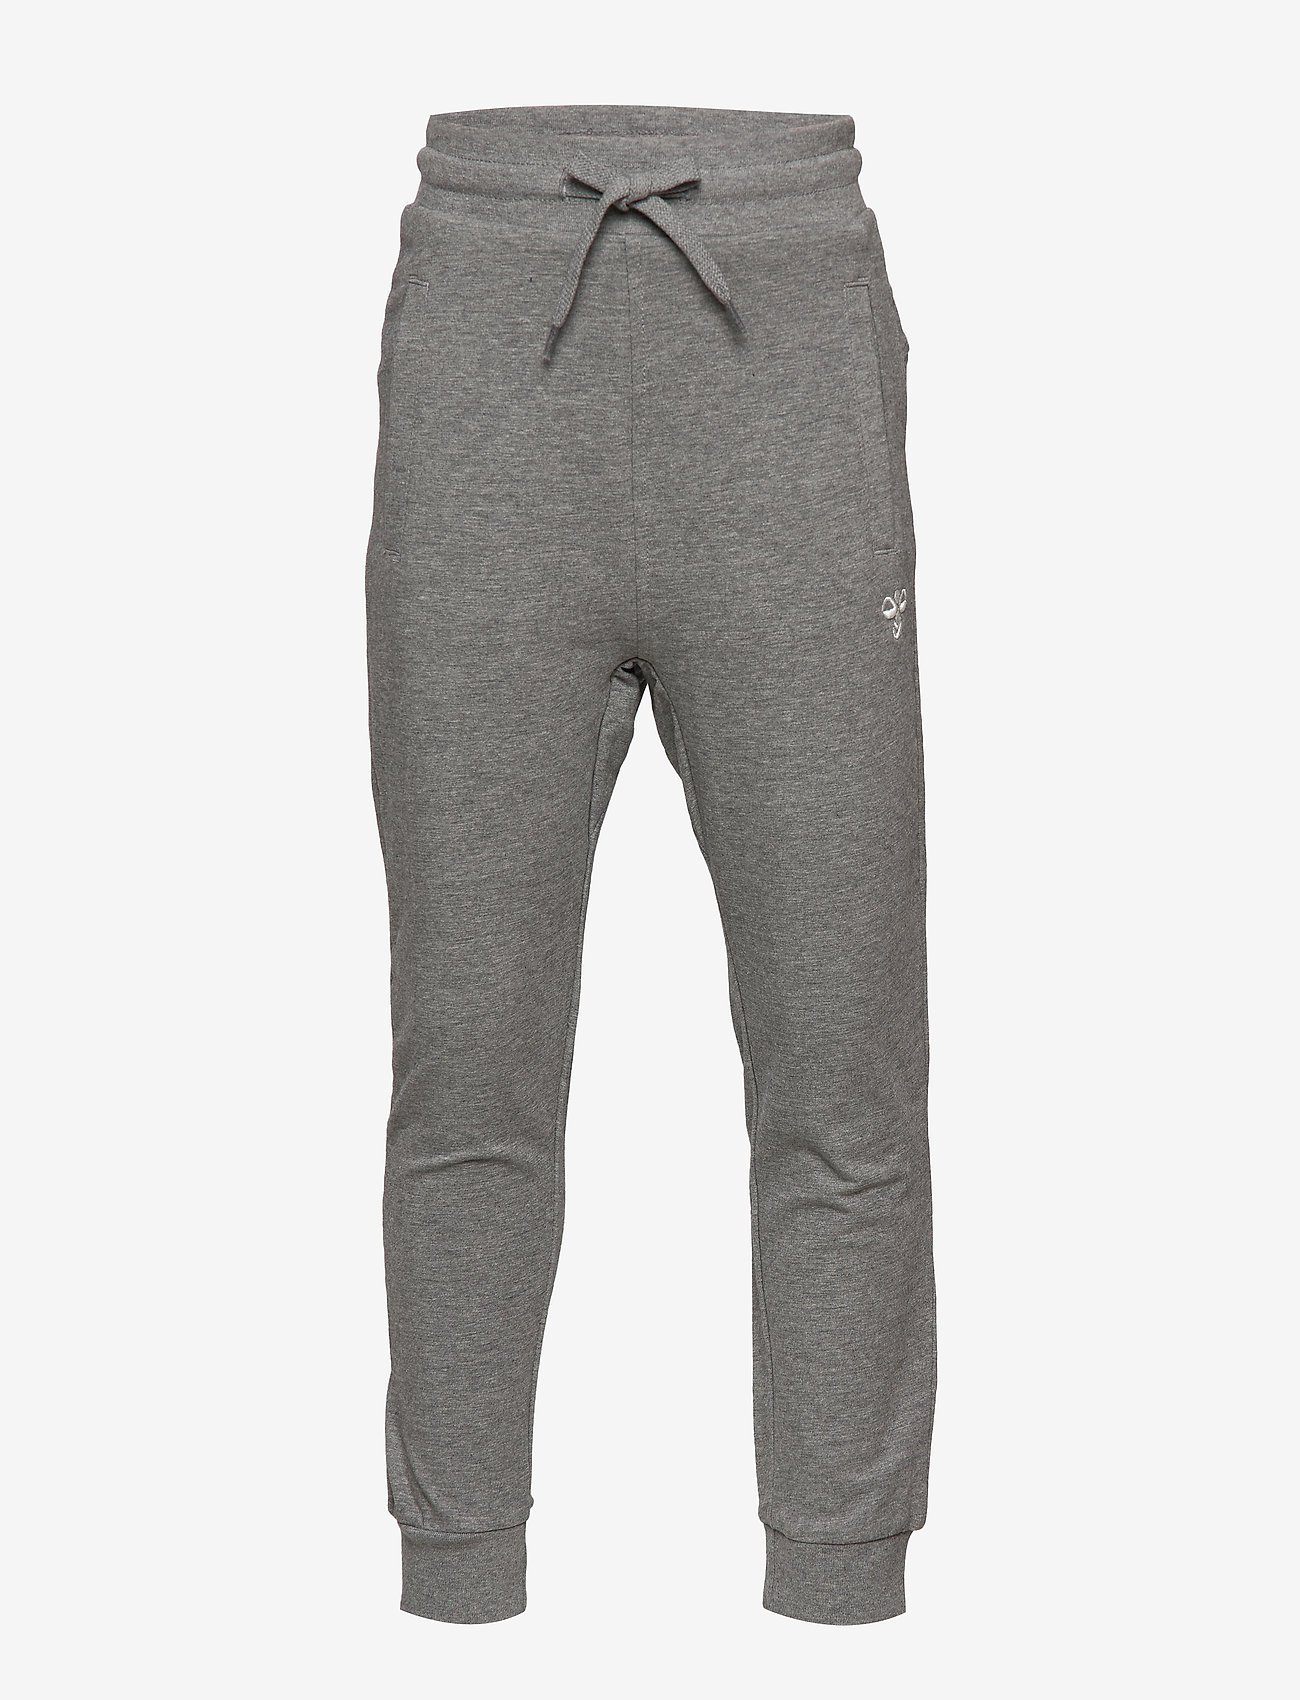 Hummel - hmlPLESS PANTS - sweatpants - medium melange - 0